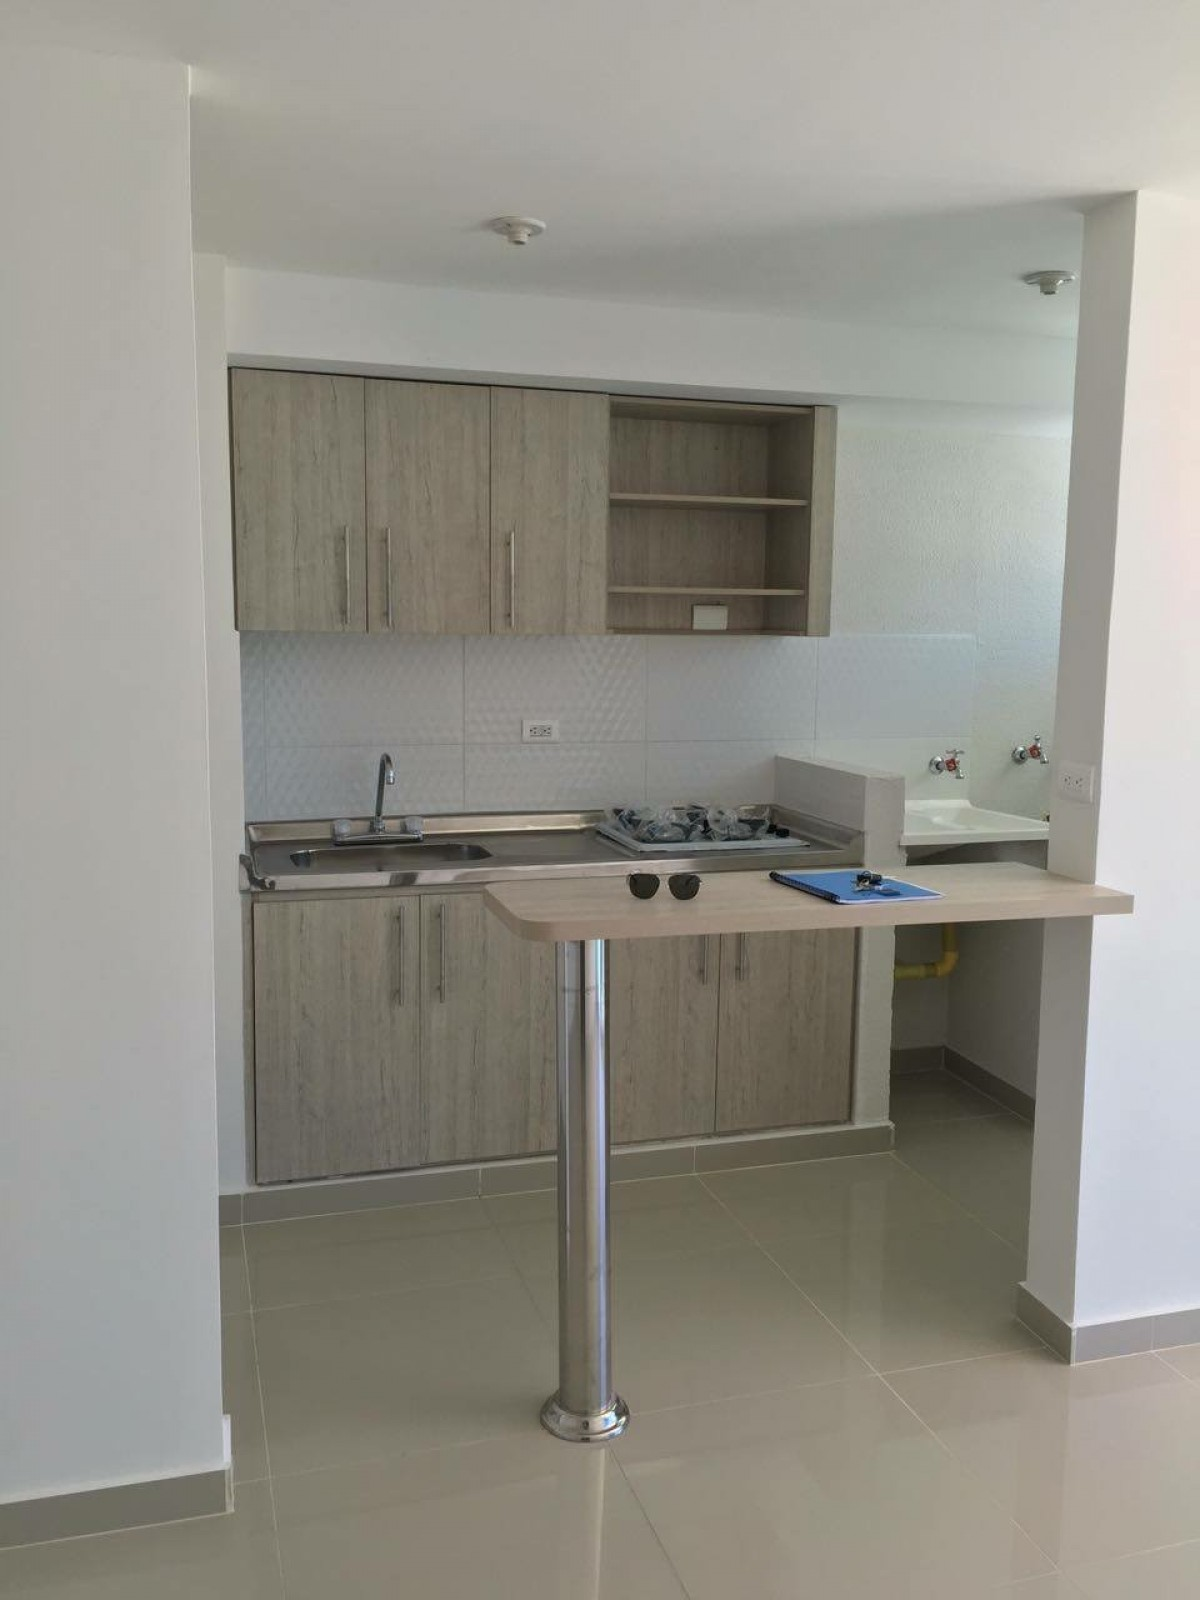 Dise o he instalaci n de cocinas y closet construyored for Aplicacion para diseno de cocinas